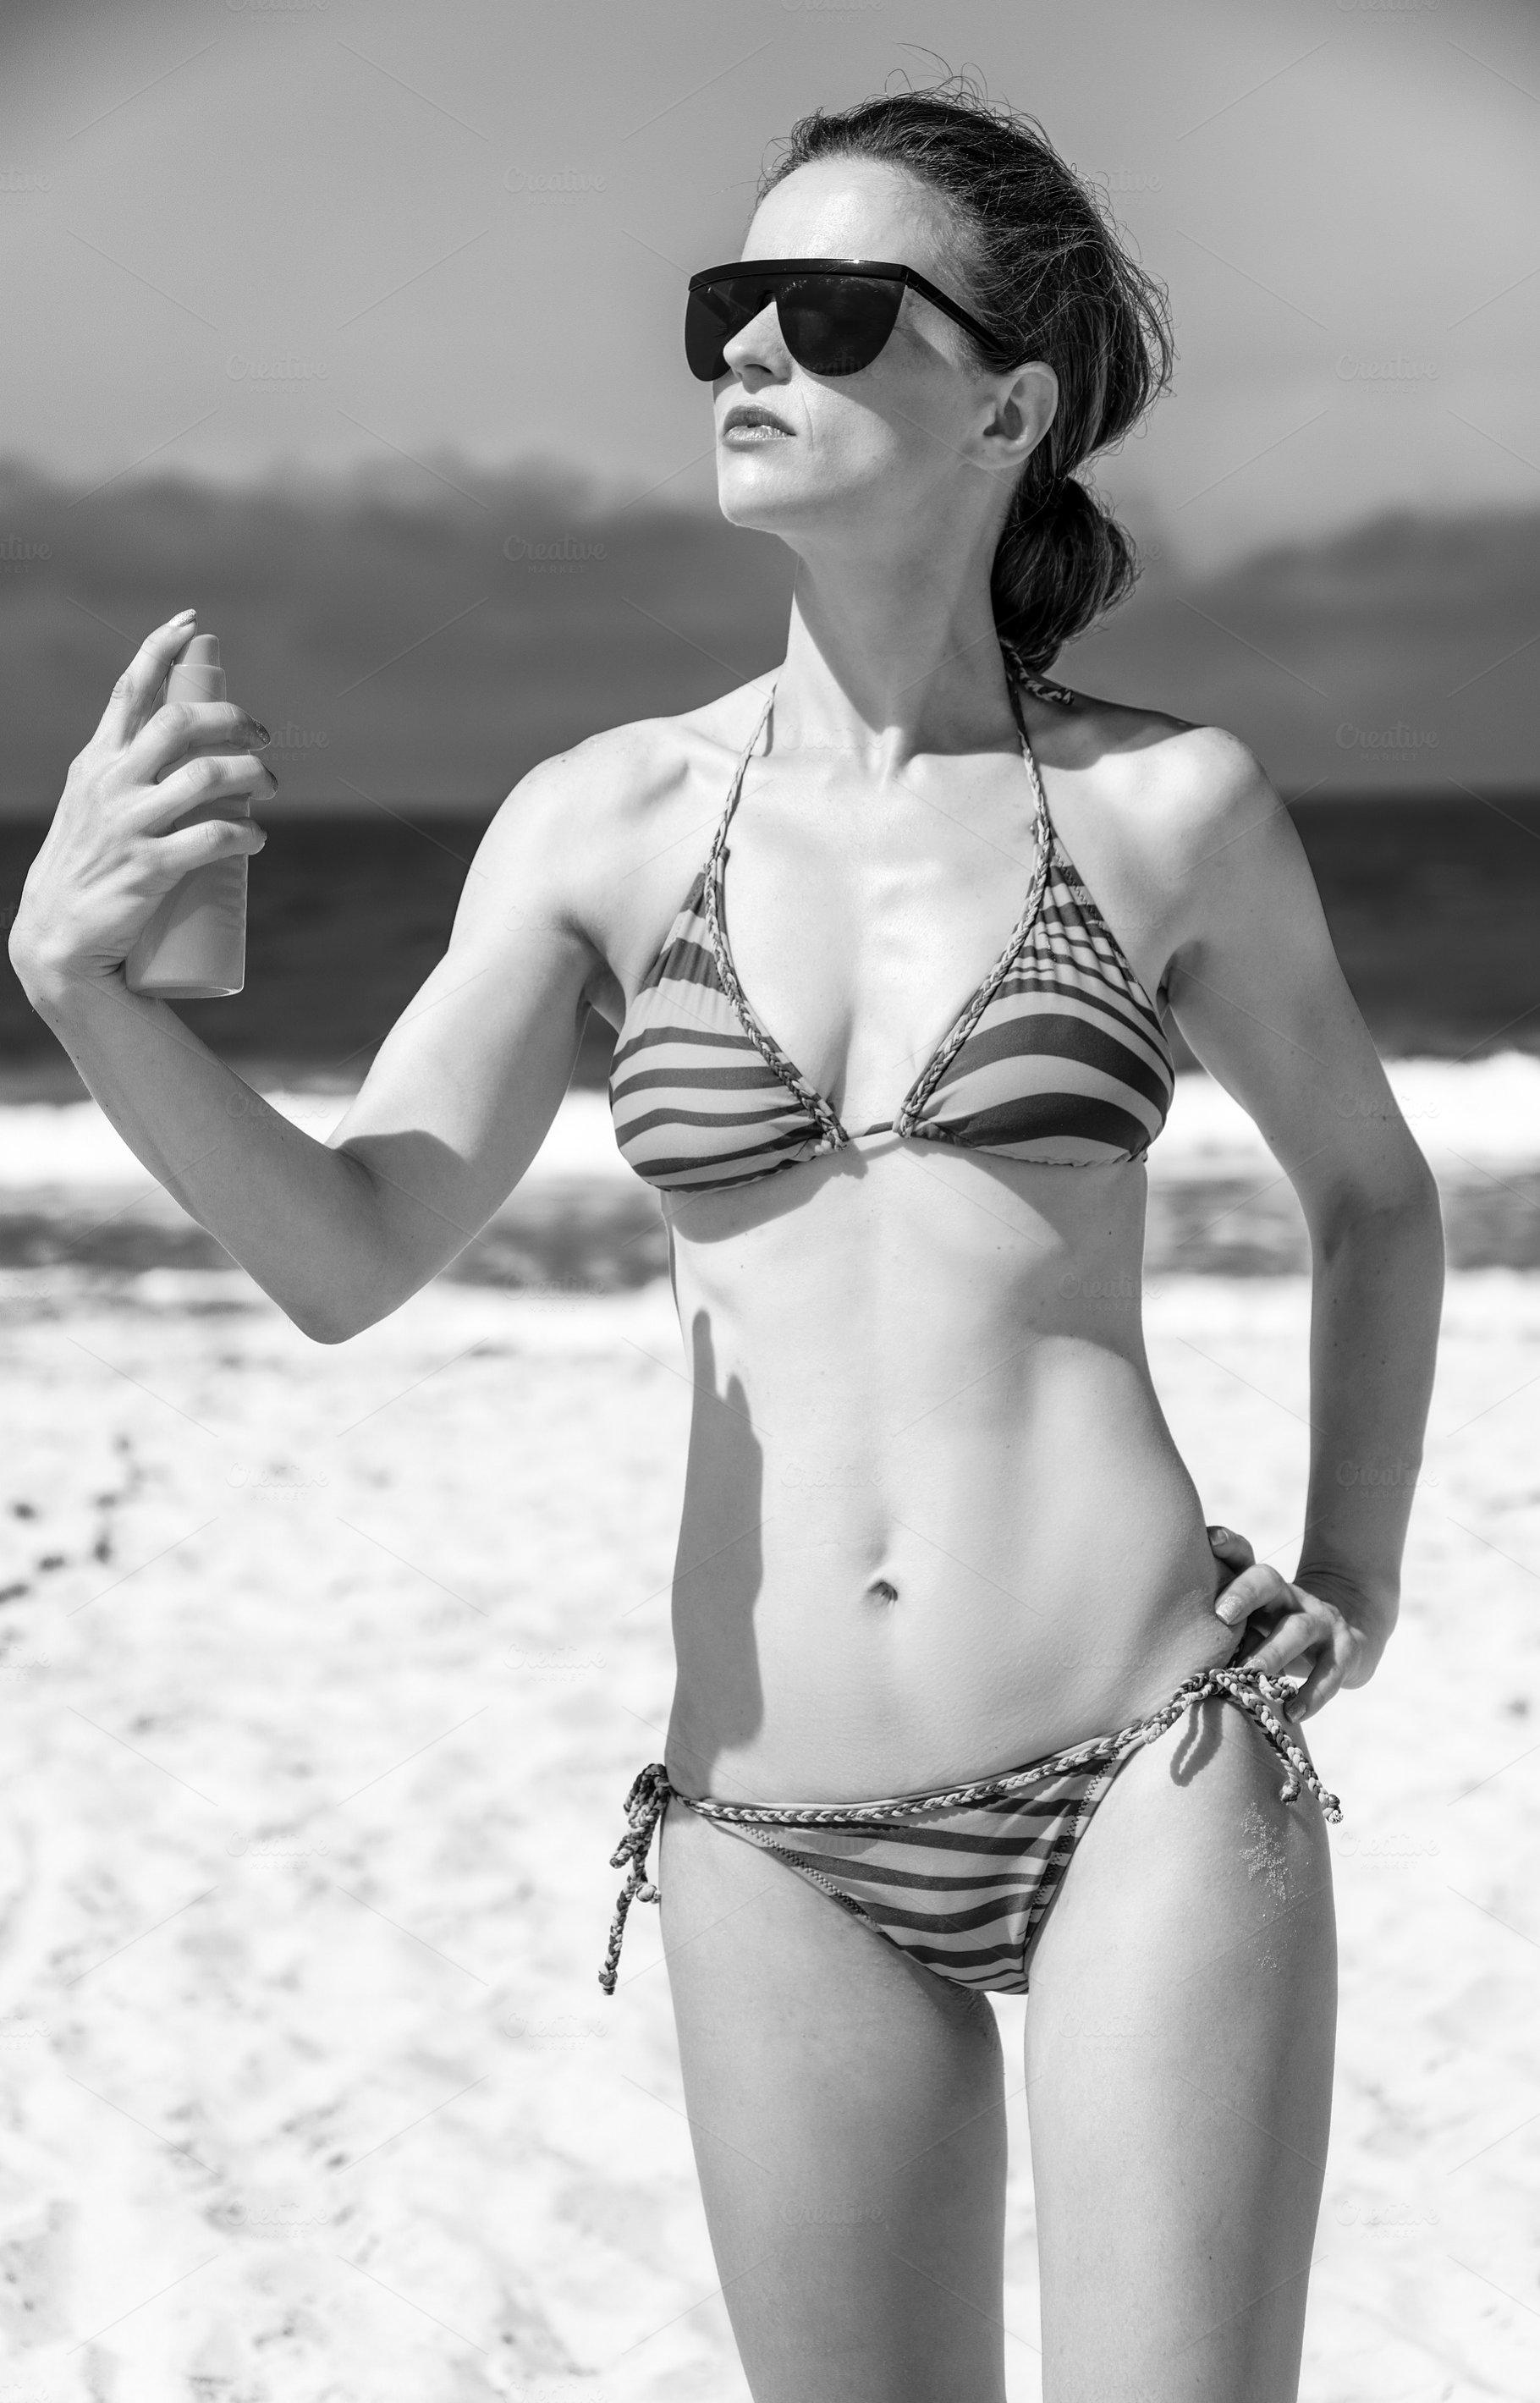 1dc0b77bc914e young woman on beach applying suntan lotion ~ People Photos ...